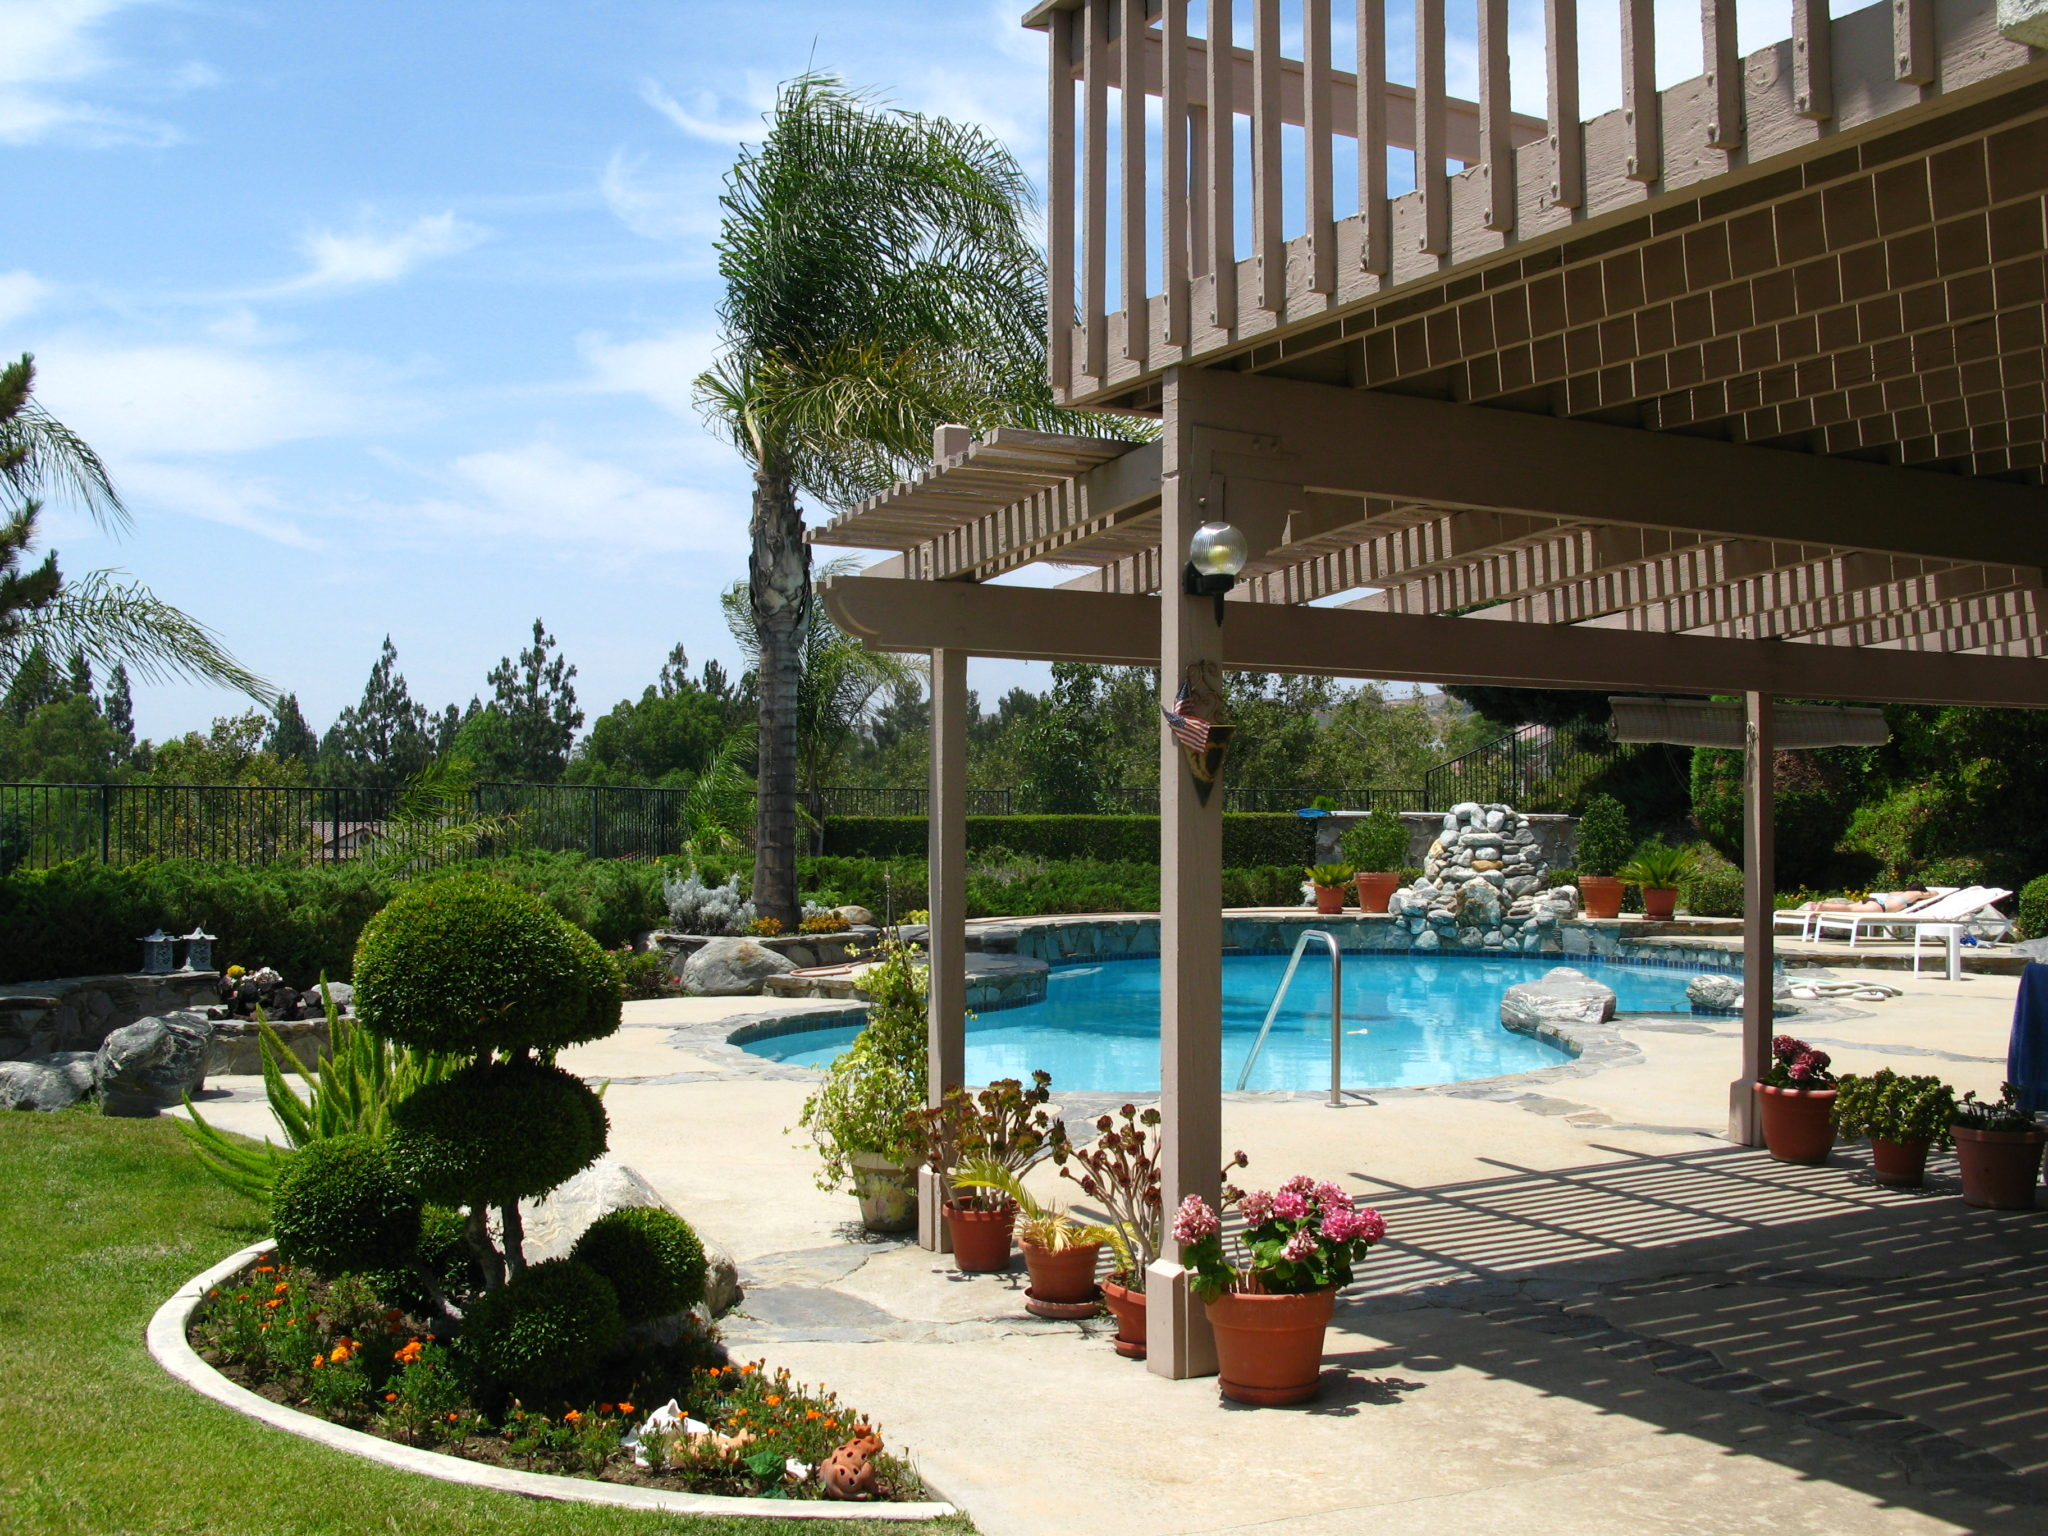 patios and decks on Pool Deck Patio Ideas id=69499